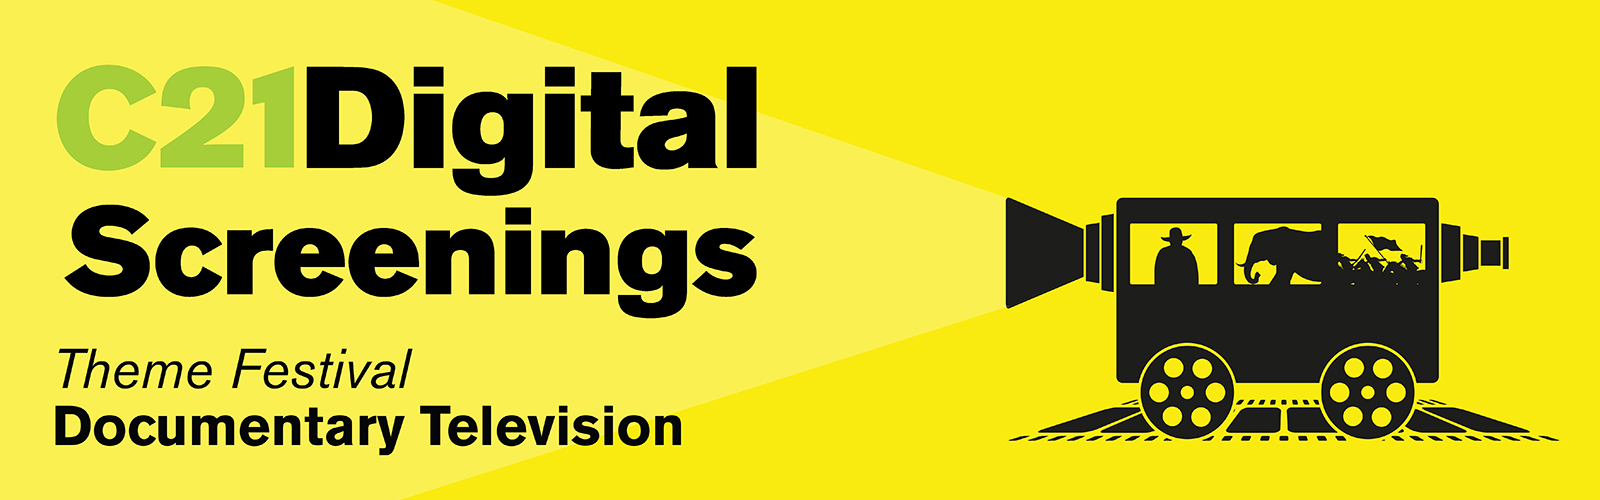 Theme Festival - Documentary Television